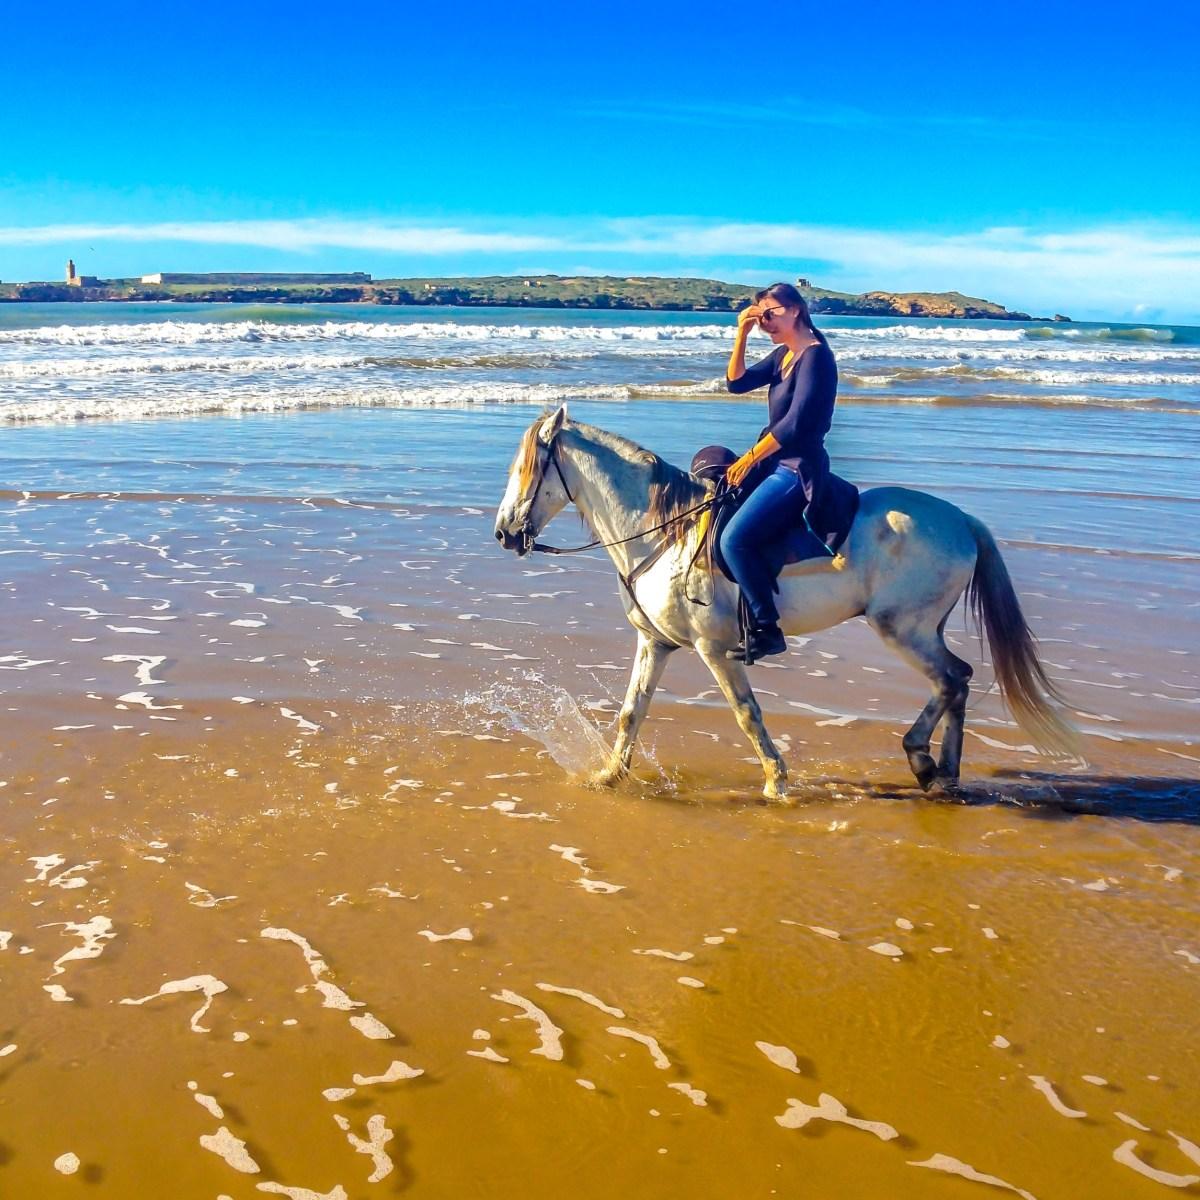 Zouina cheval Essaouira maroc